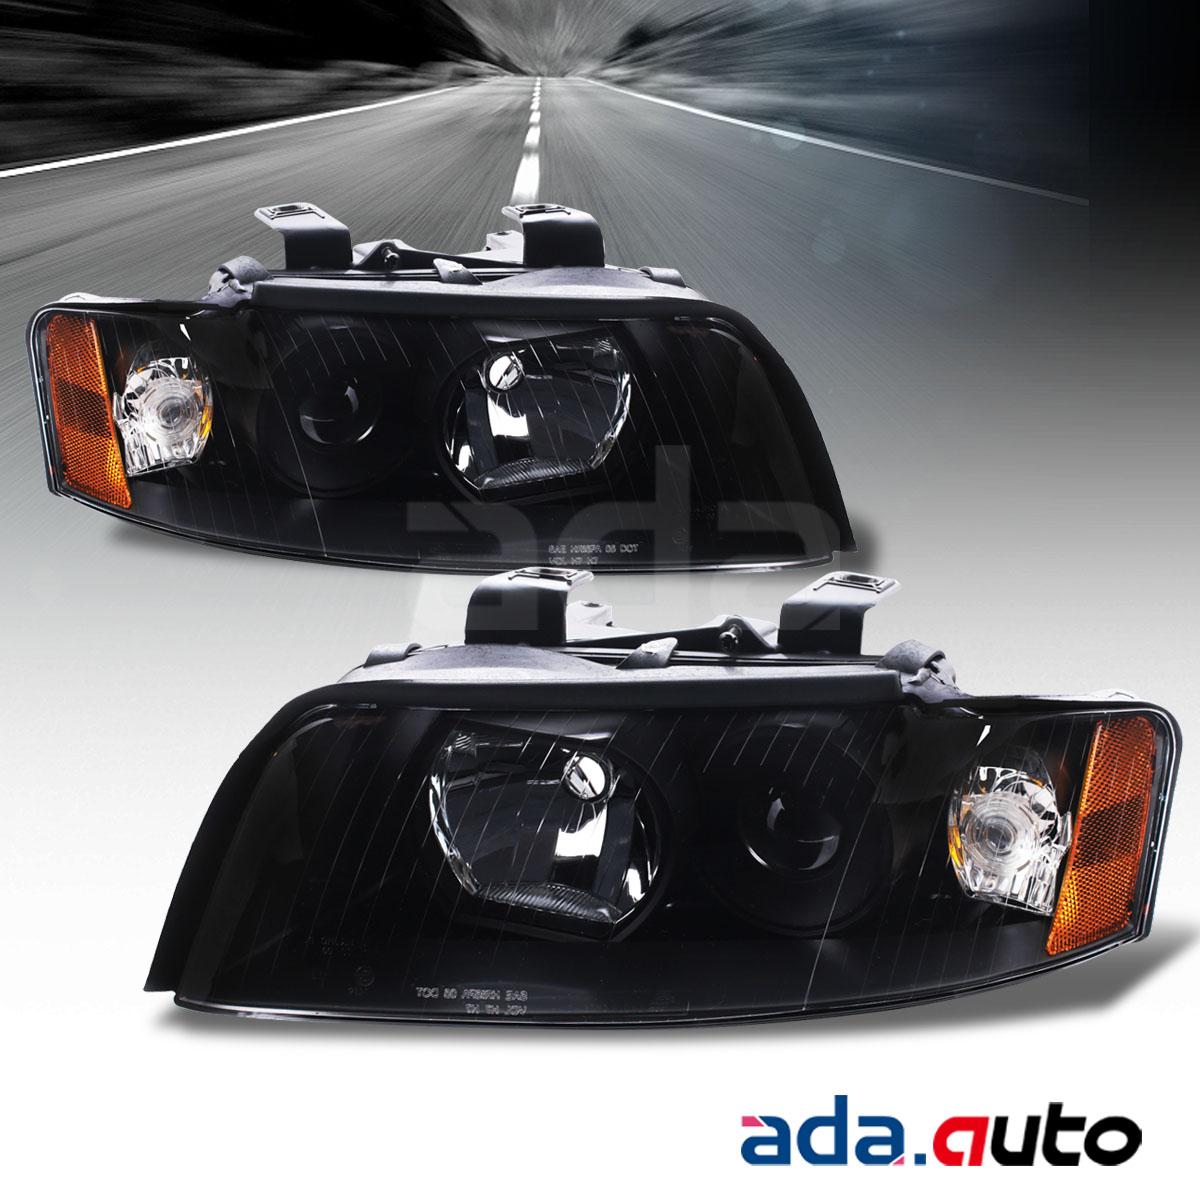 2002 2005 audi a4 s4 type 8e 8h factory style black headlights left right set. Black Bedroom Furniture Sets. Home Design Ideas